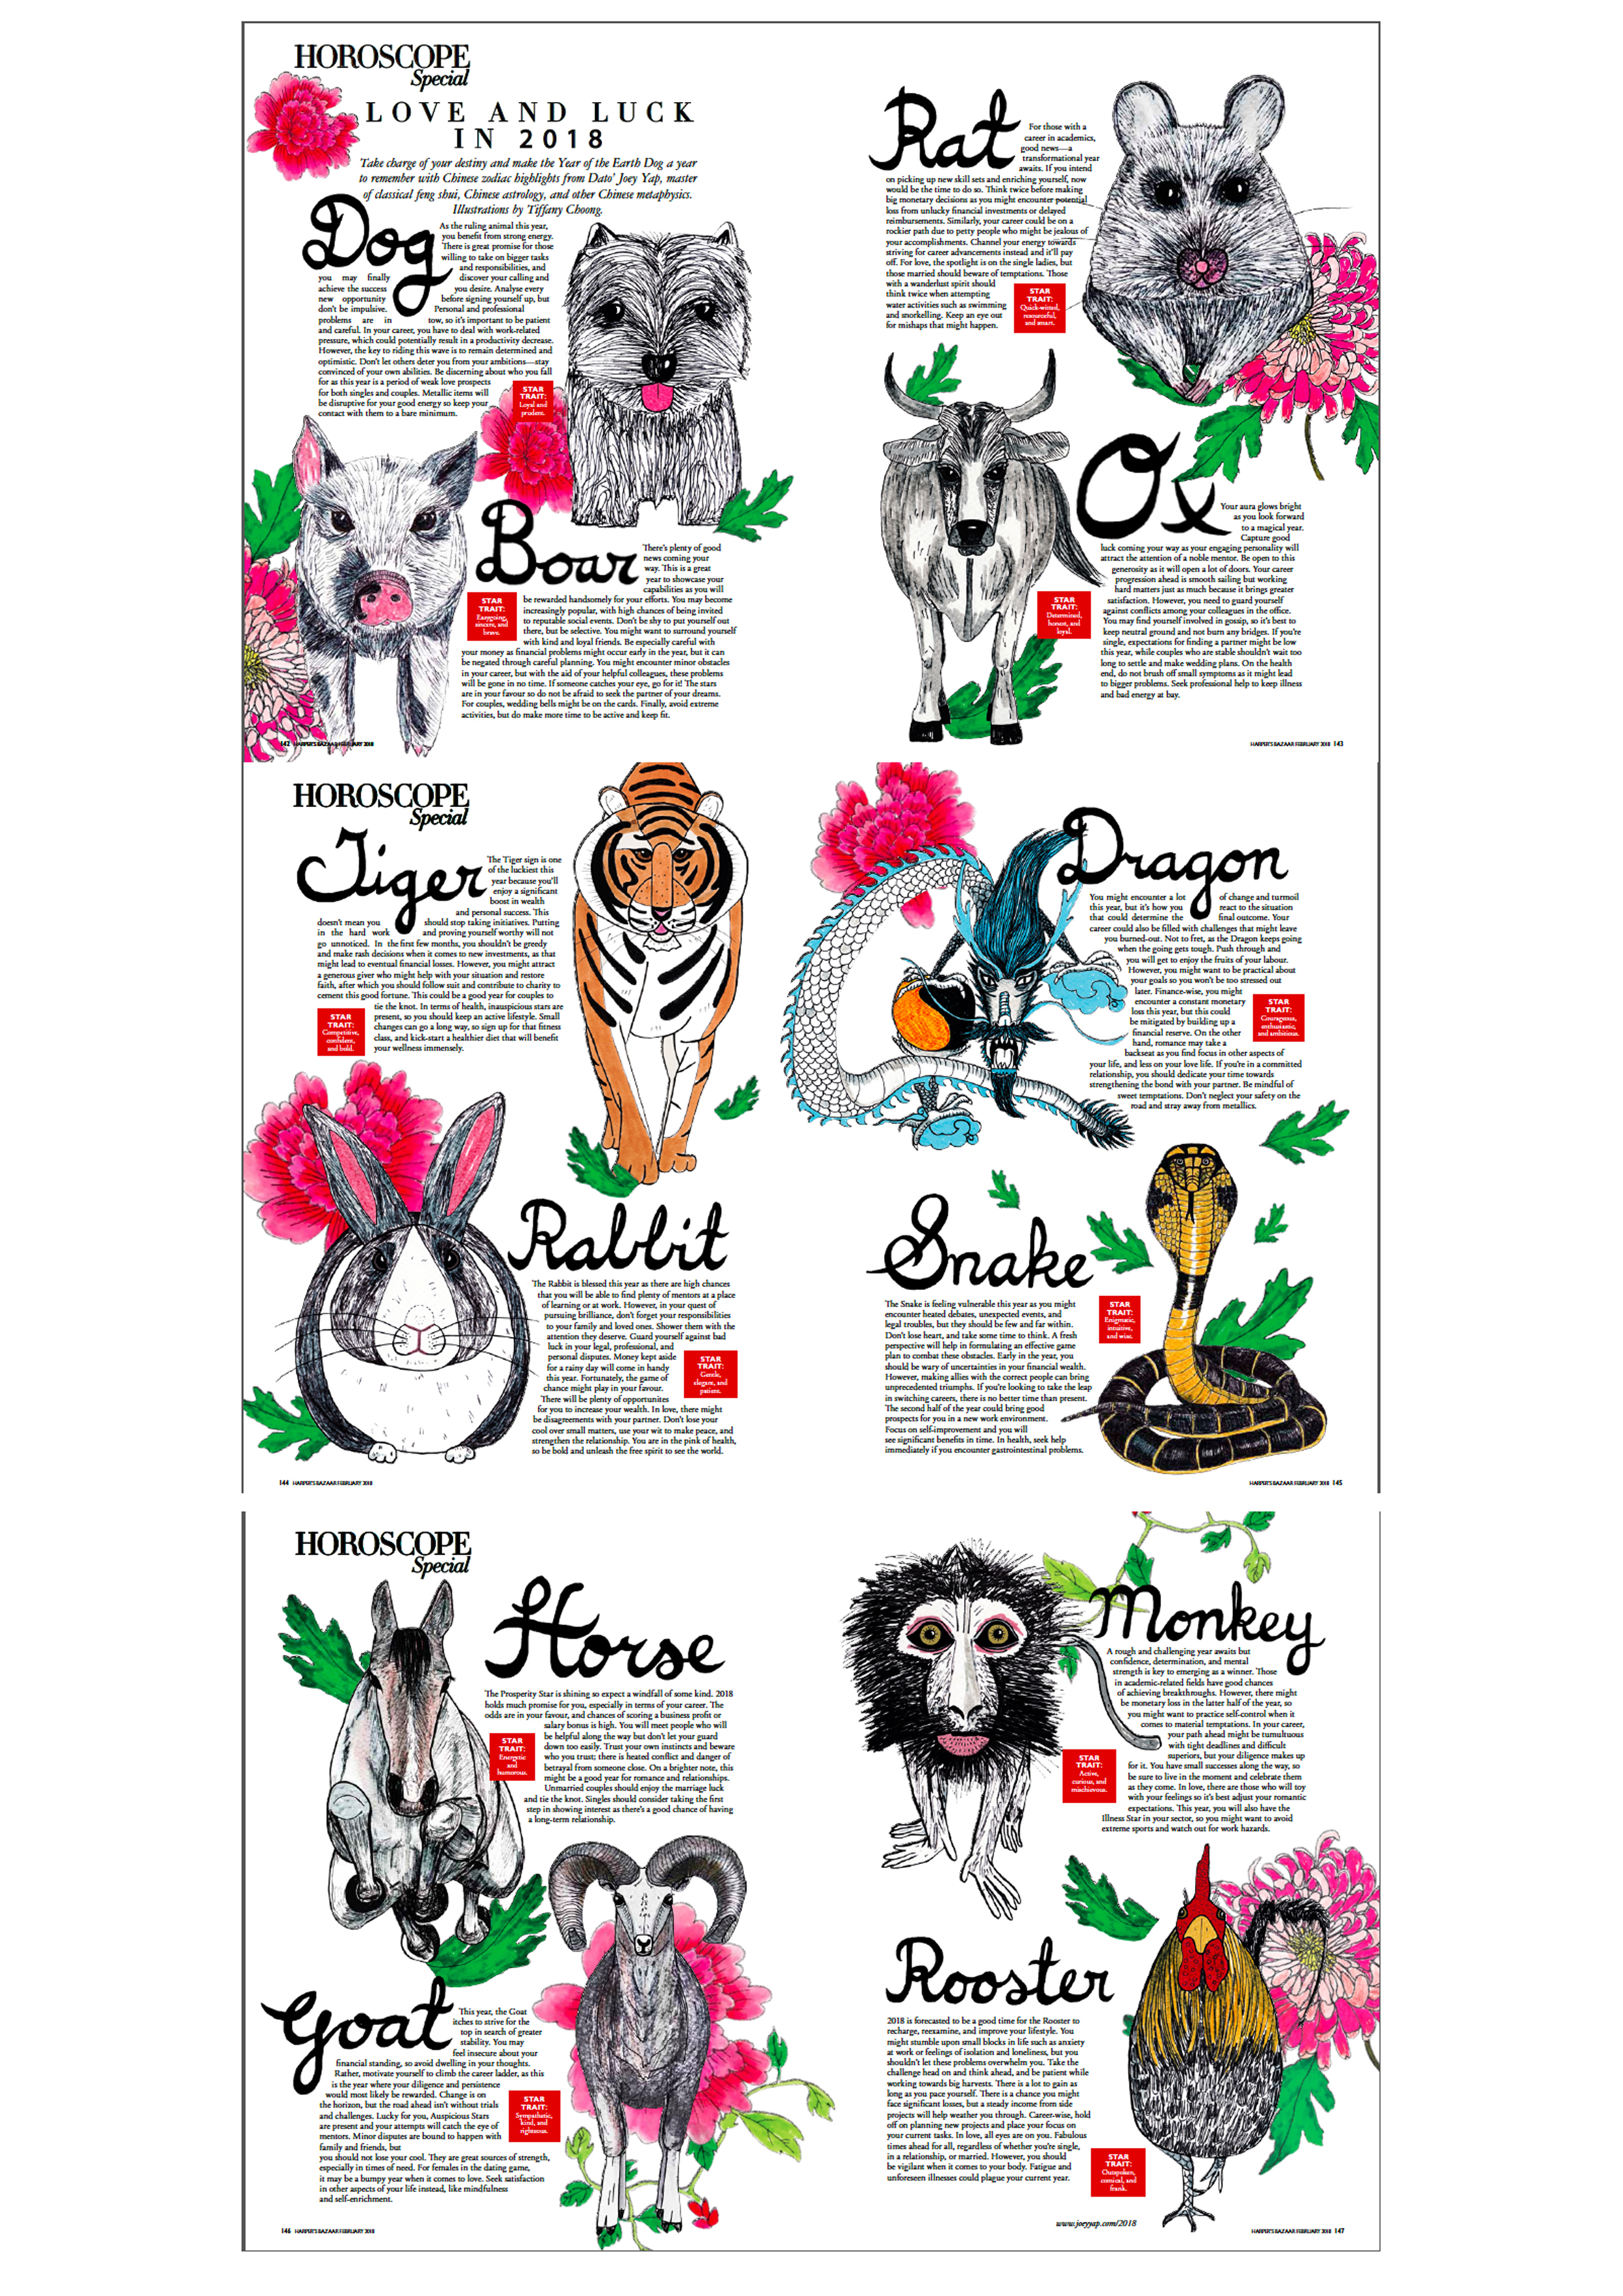 Harpers bazaar zodiac Feb 2018